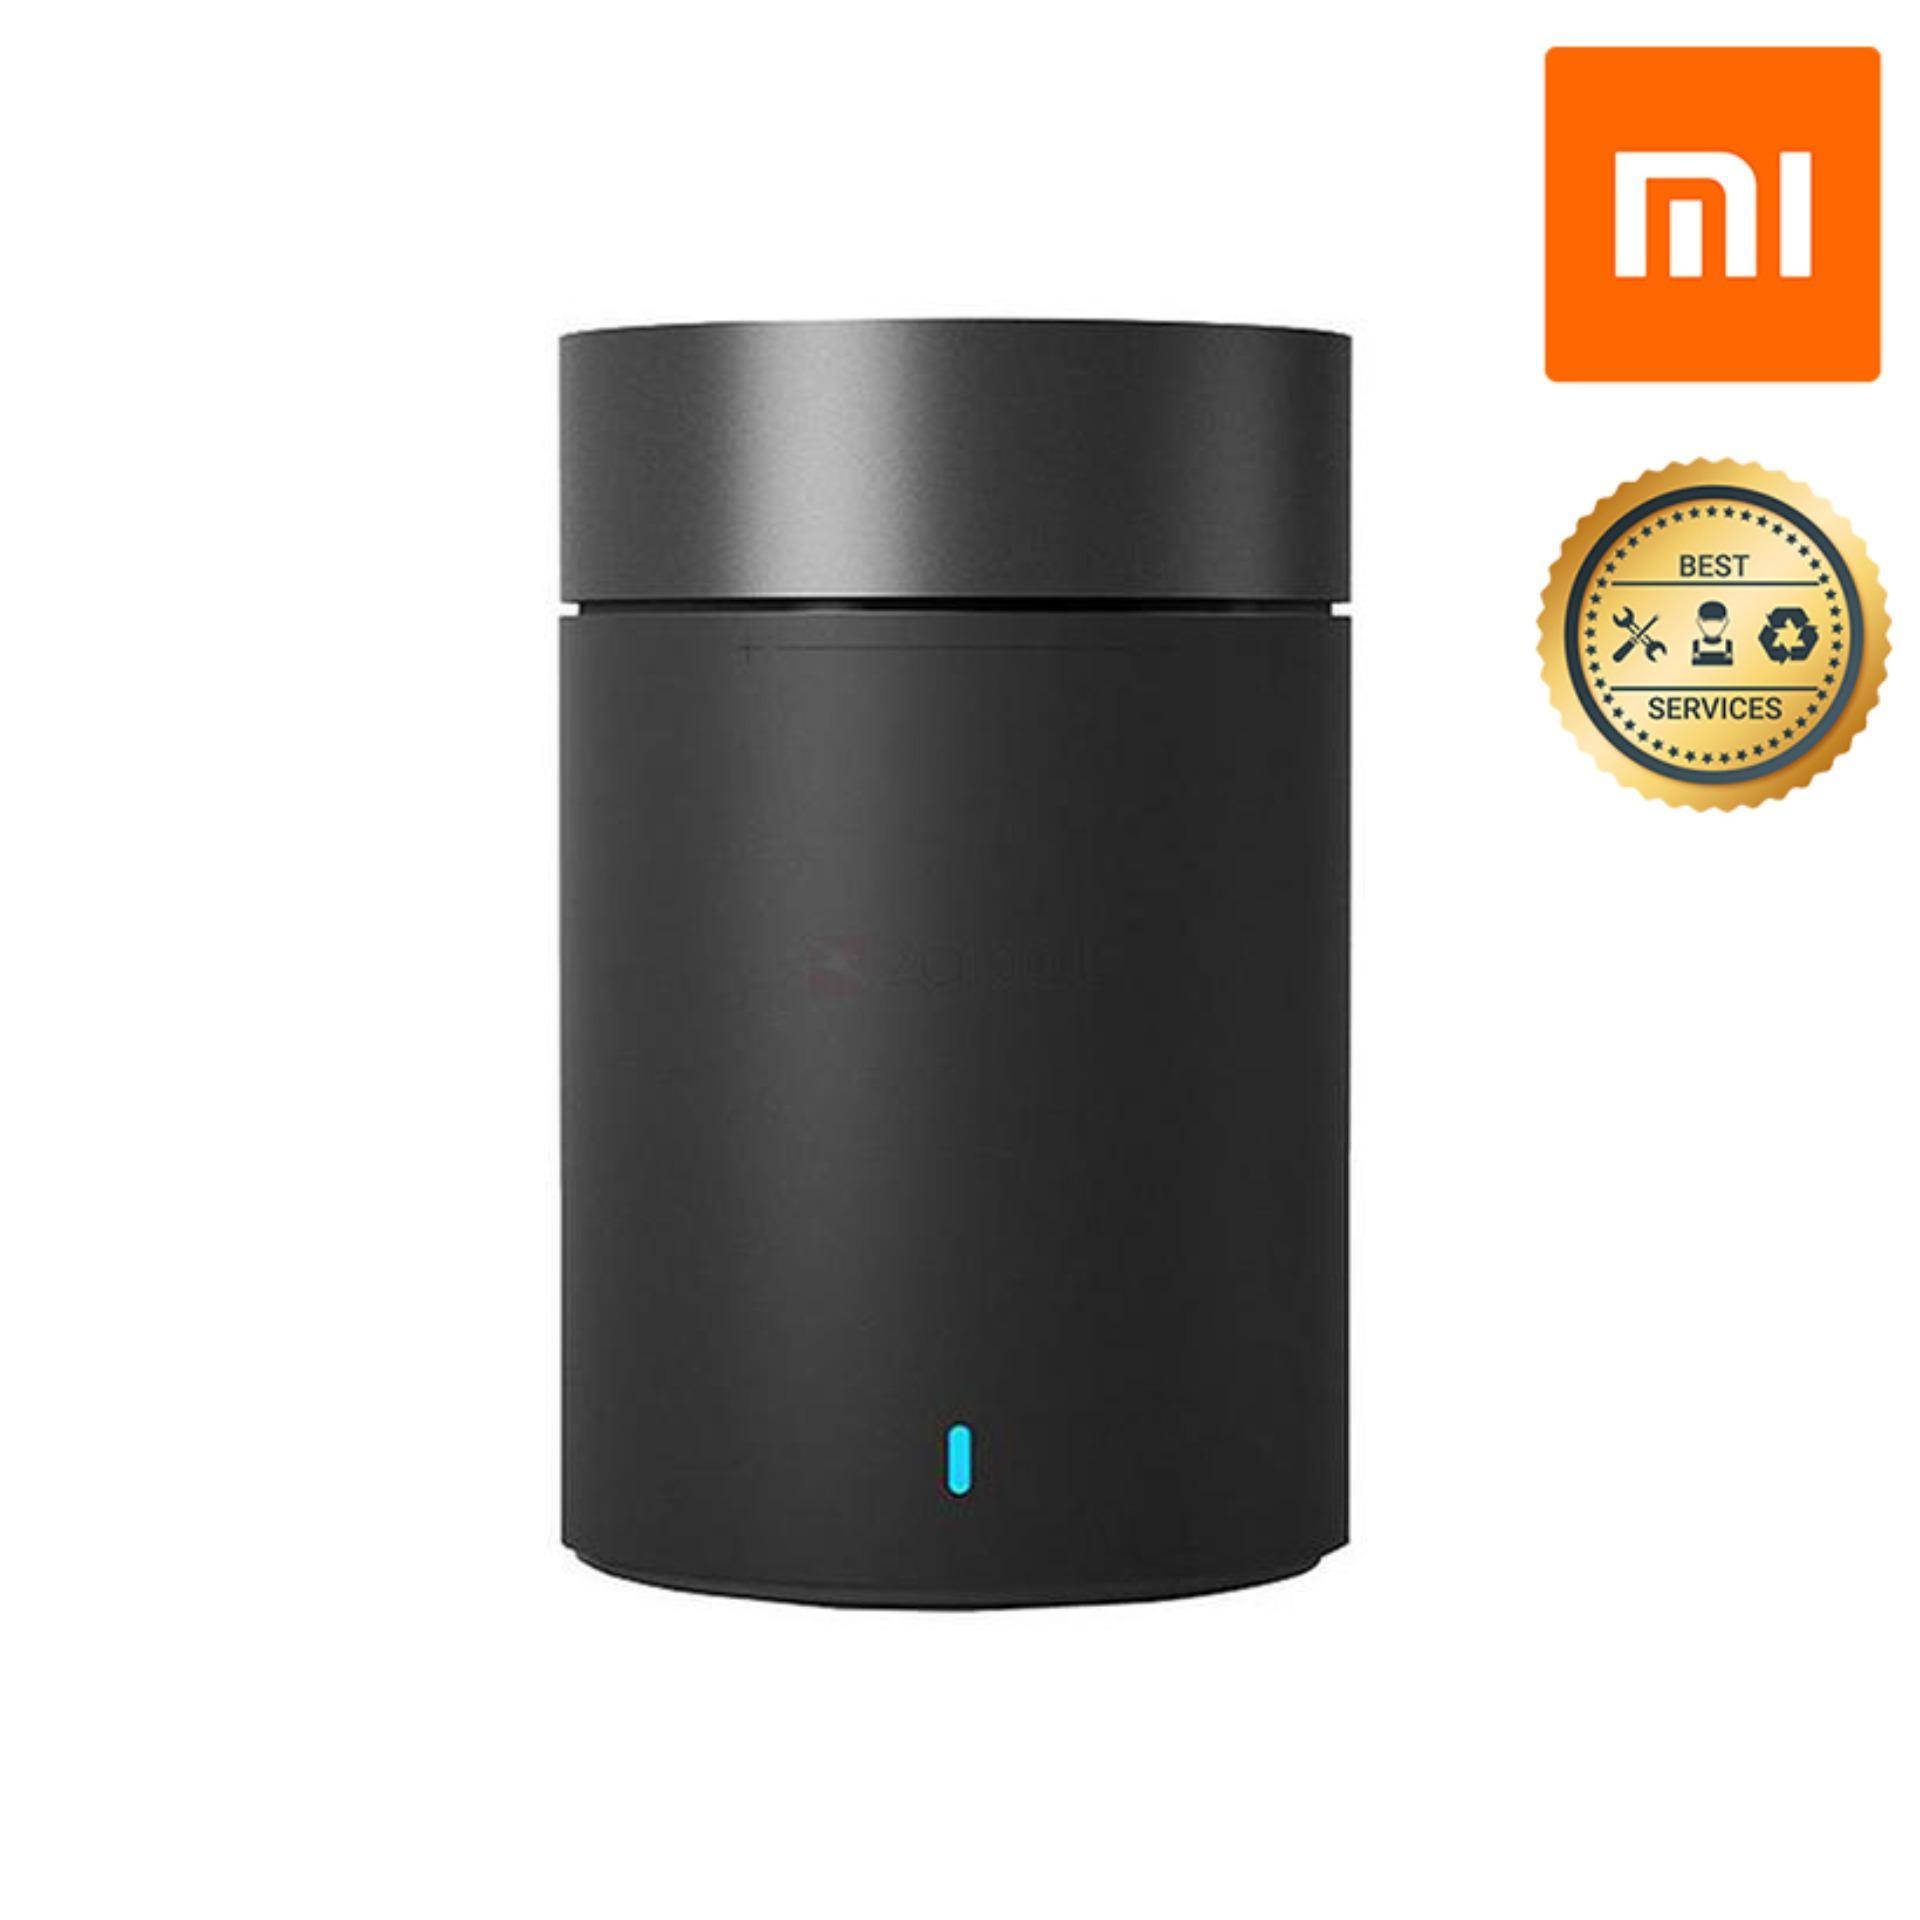 Loa nghe nhạc Xiaomi Pocket Speaker 2 (Đen)